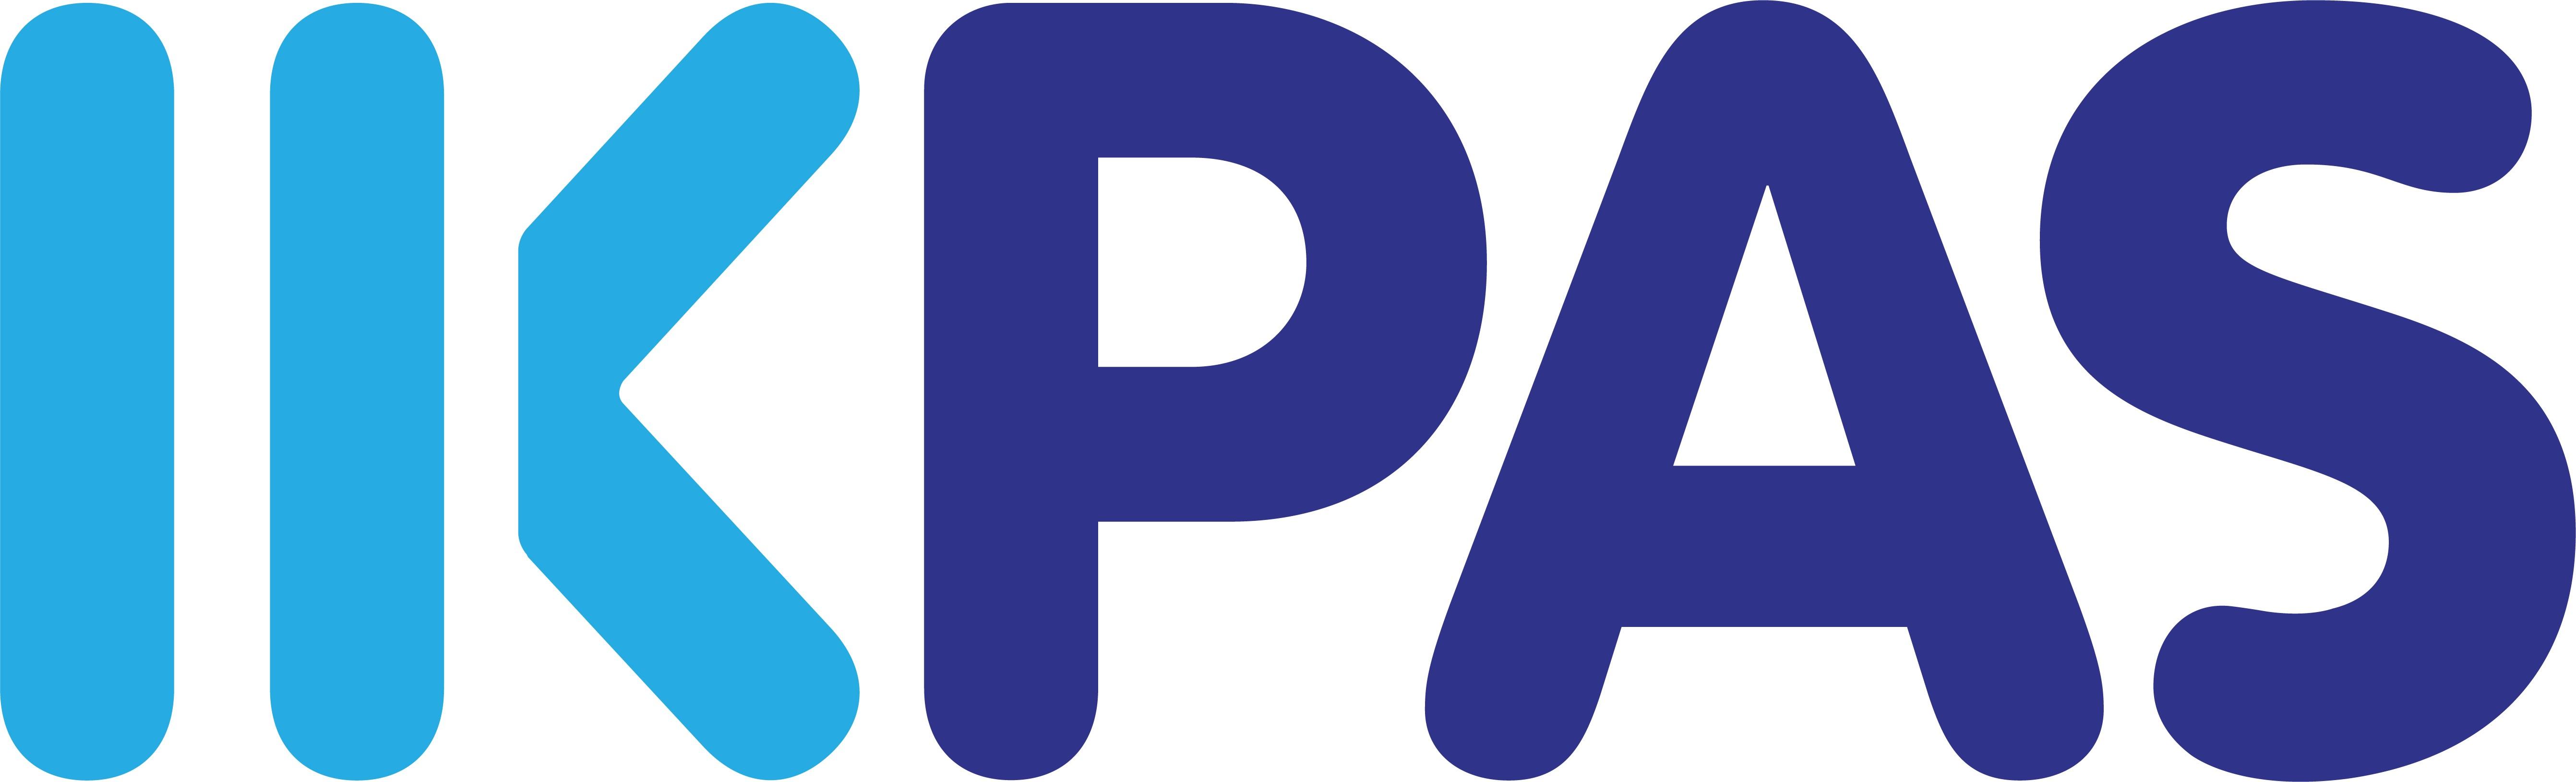 IkPas